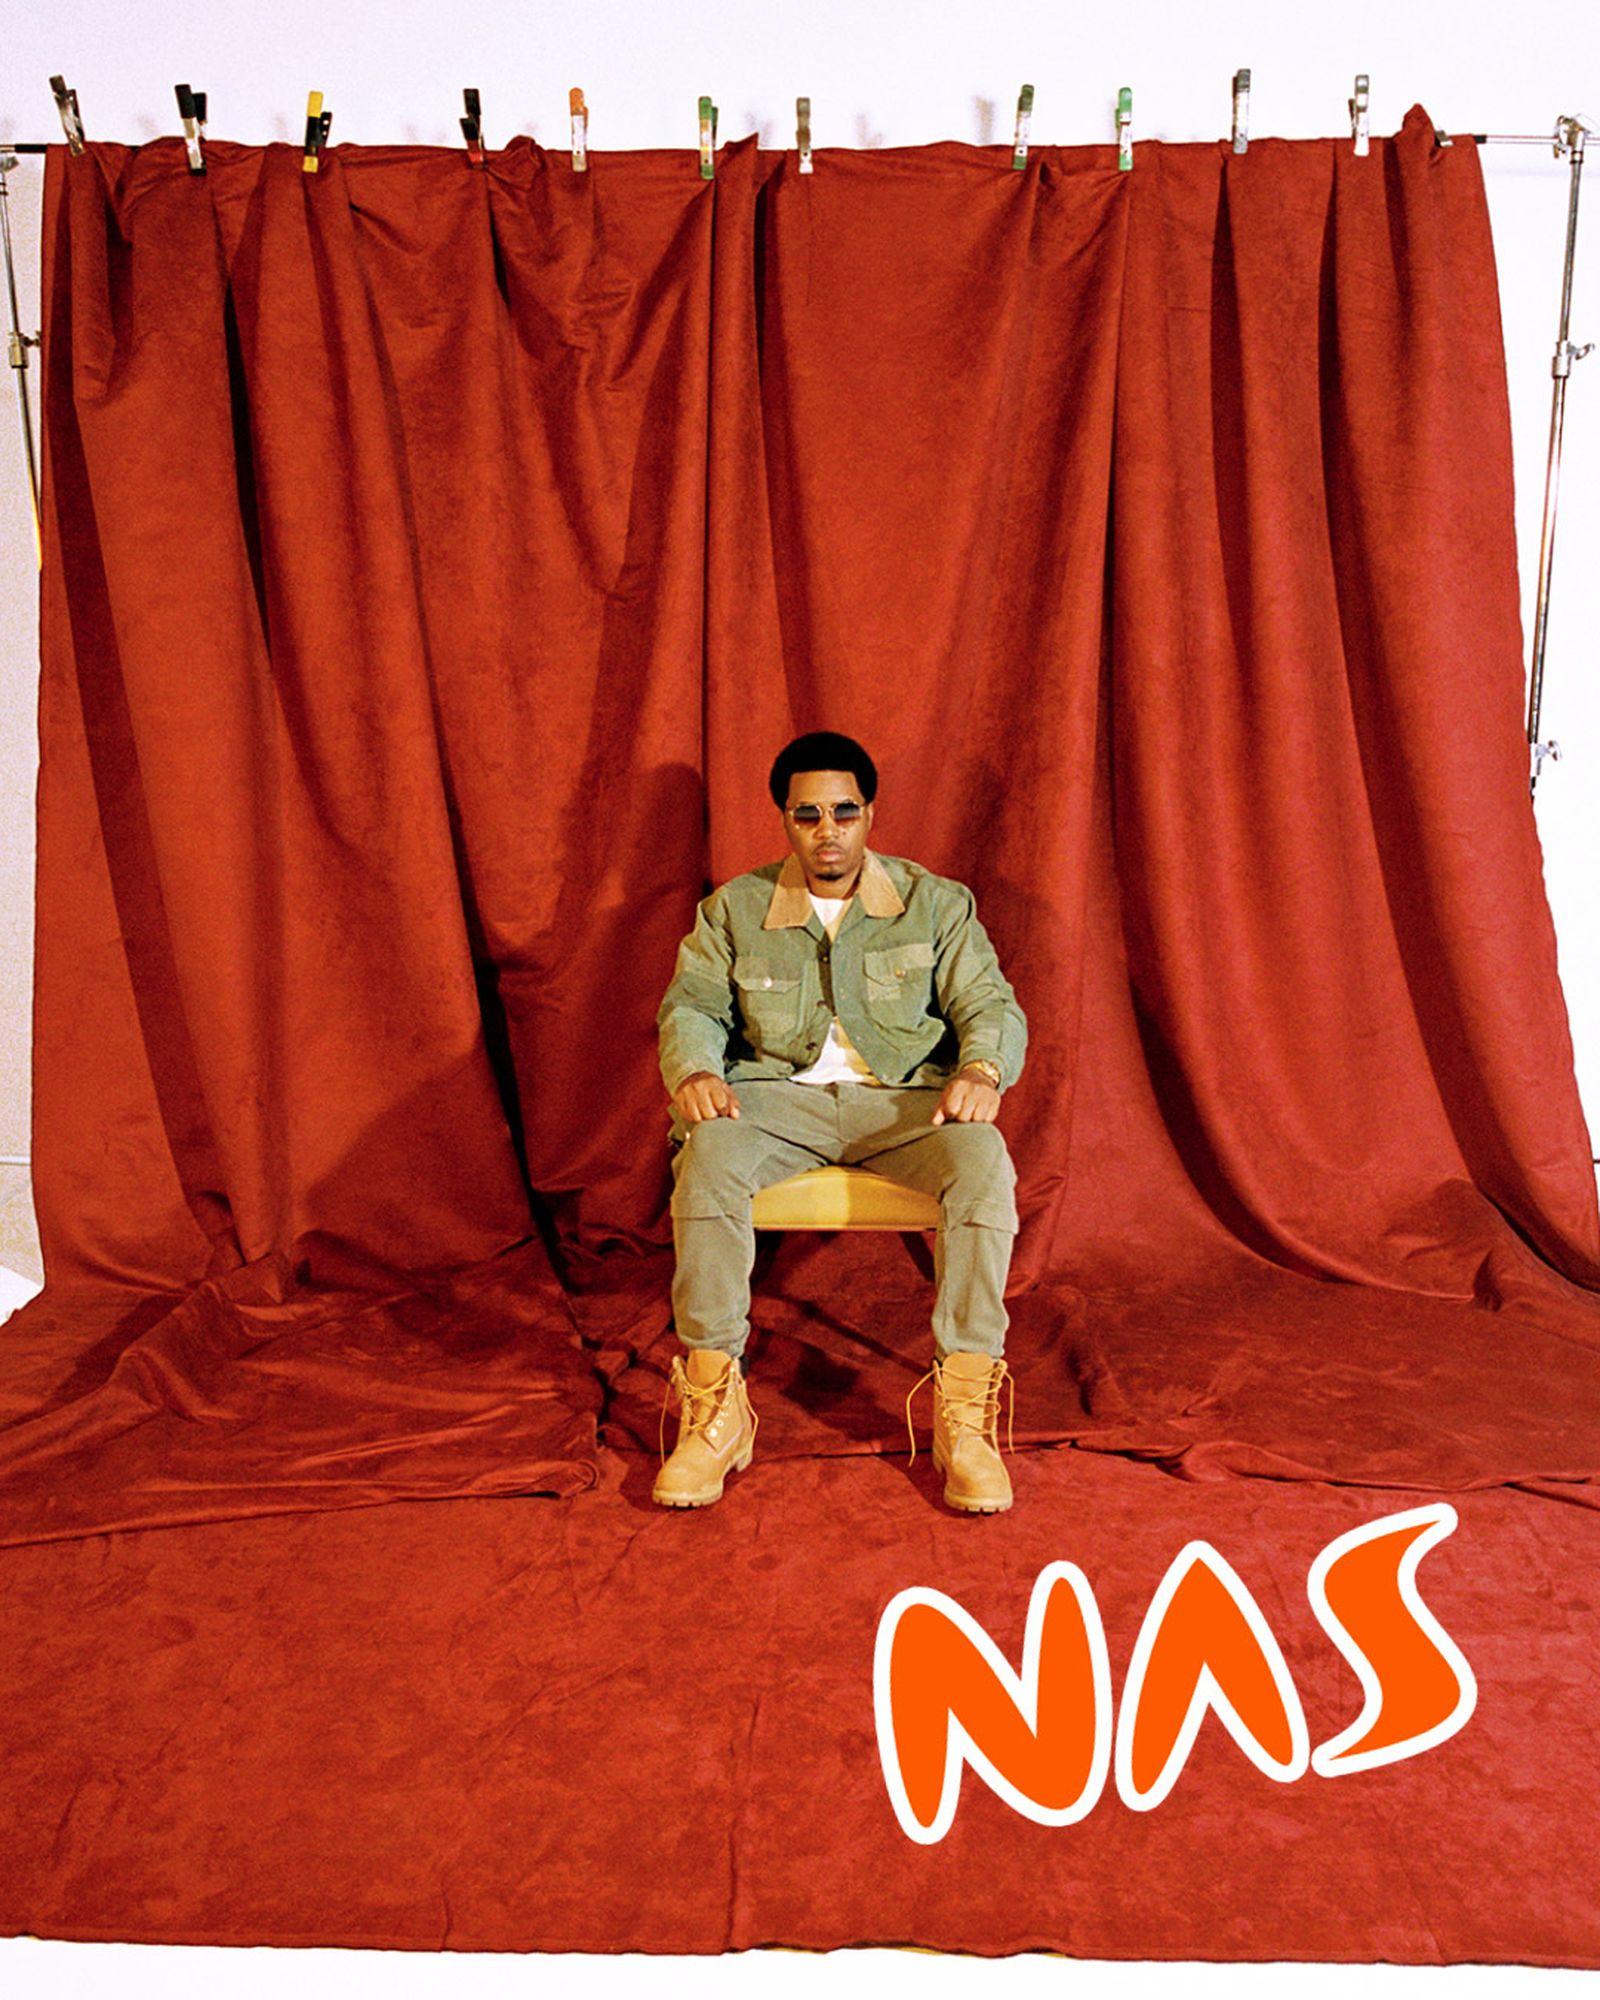 nas-shows-us-hes-made-main-02